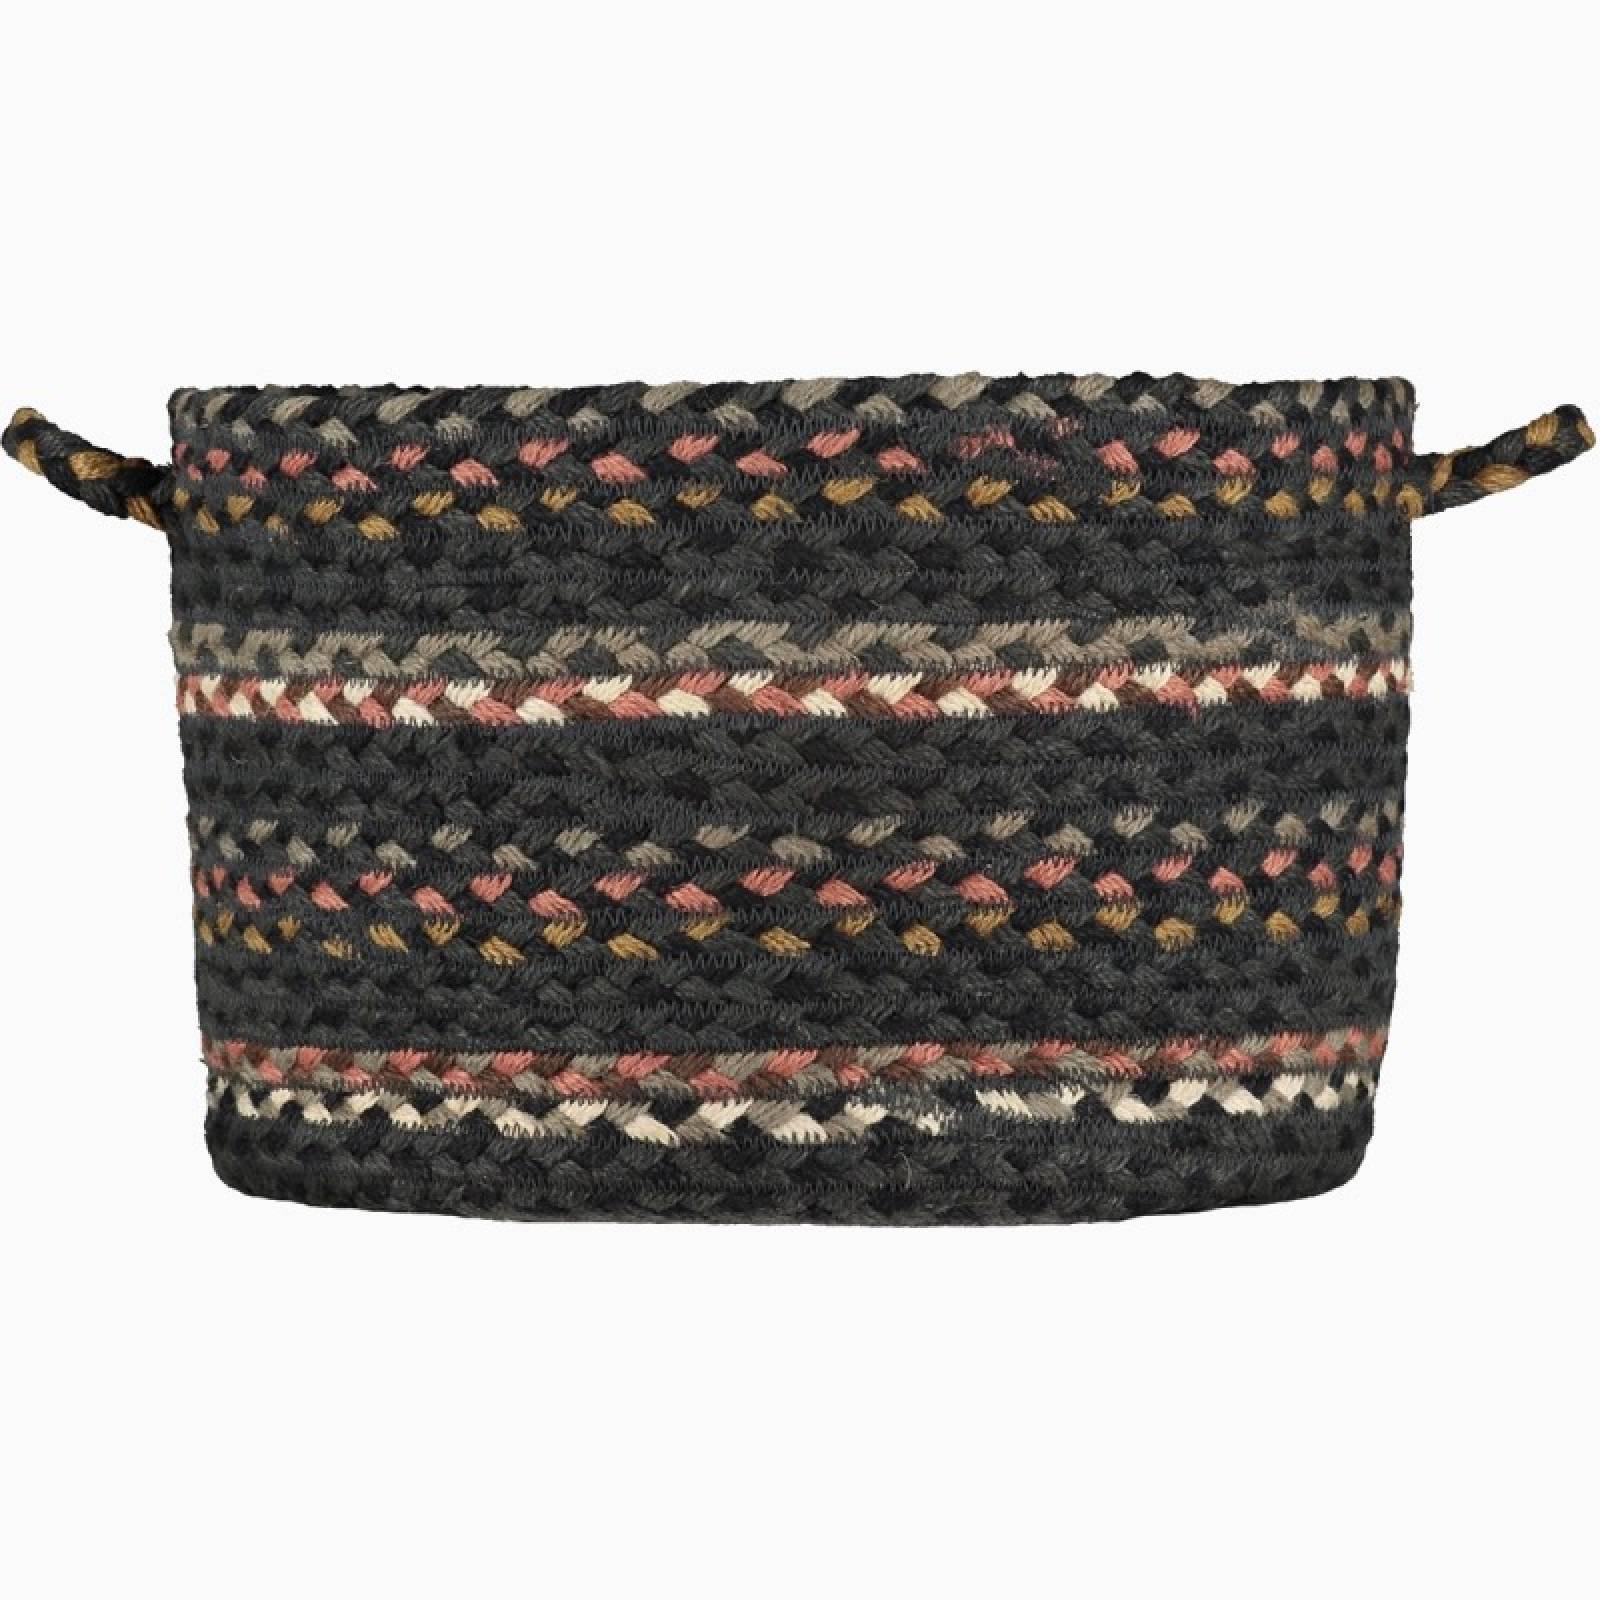 Small Stripe Jute Basket In Black Marble 18x23cm